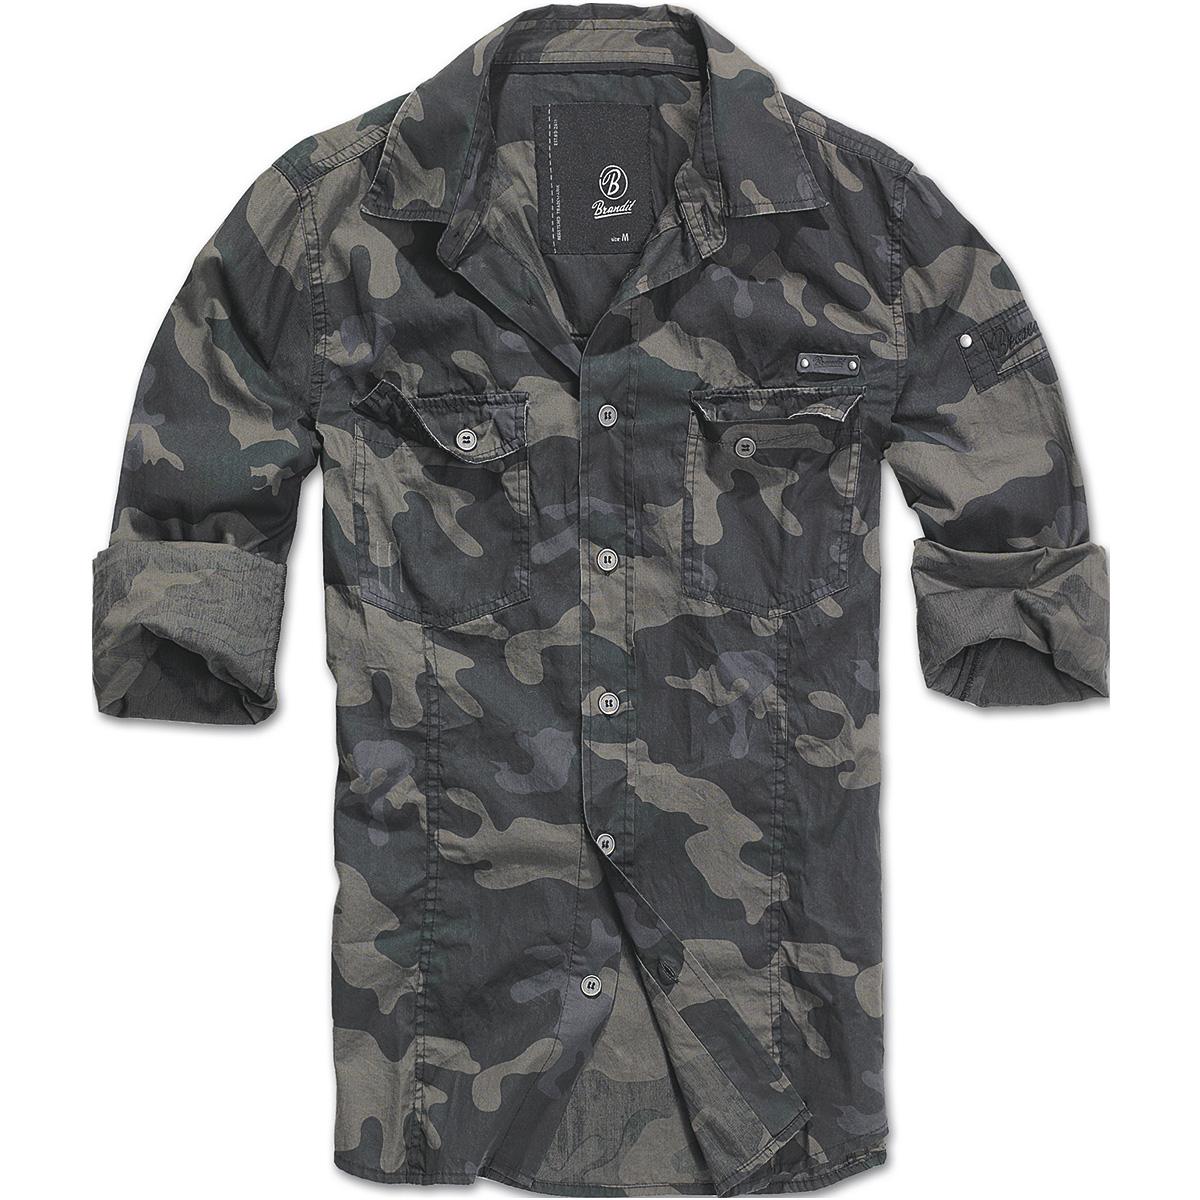 5241e99af97 Sentinel Brandit Mens Slimfit Hiking Shirt Military Long Sleeve Army Cotton  Top Dark Camo